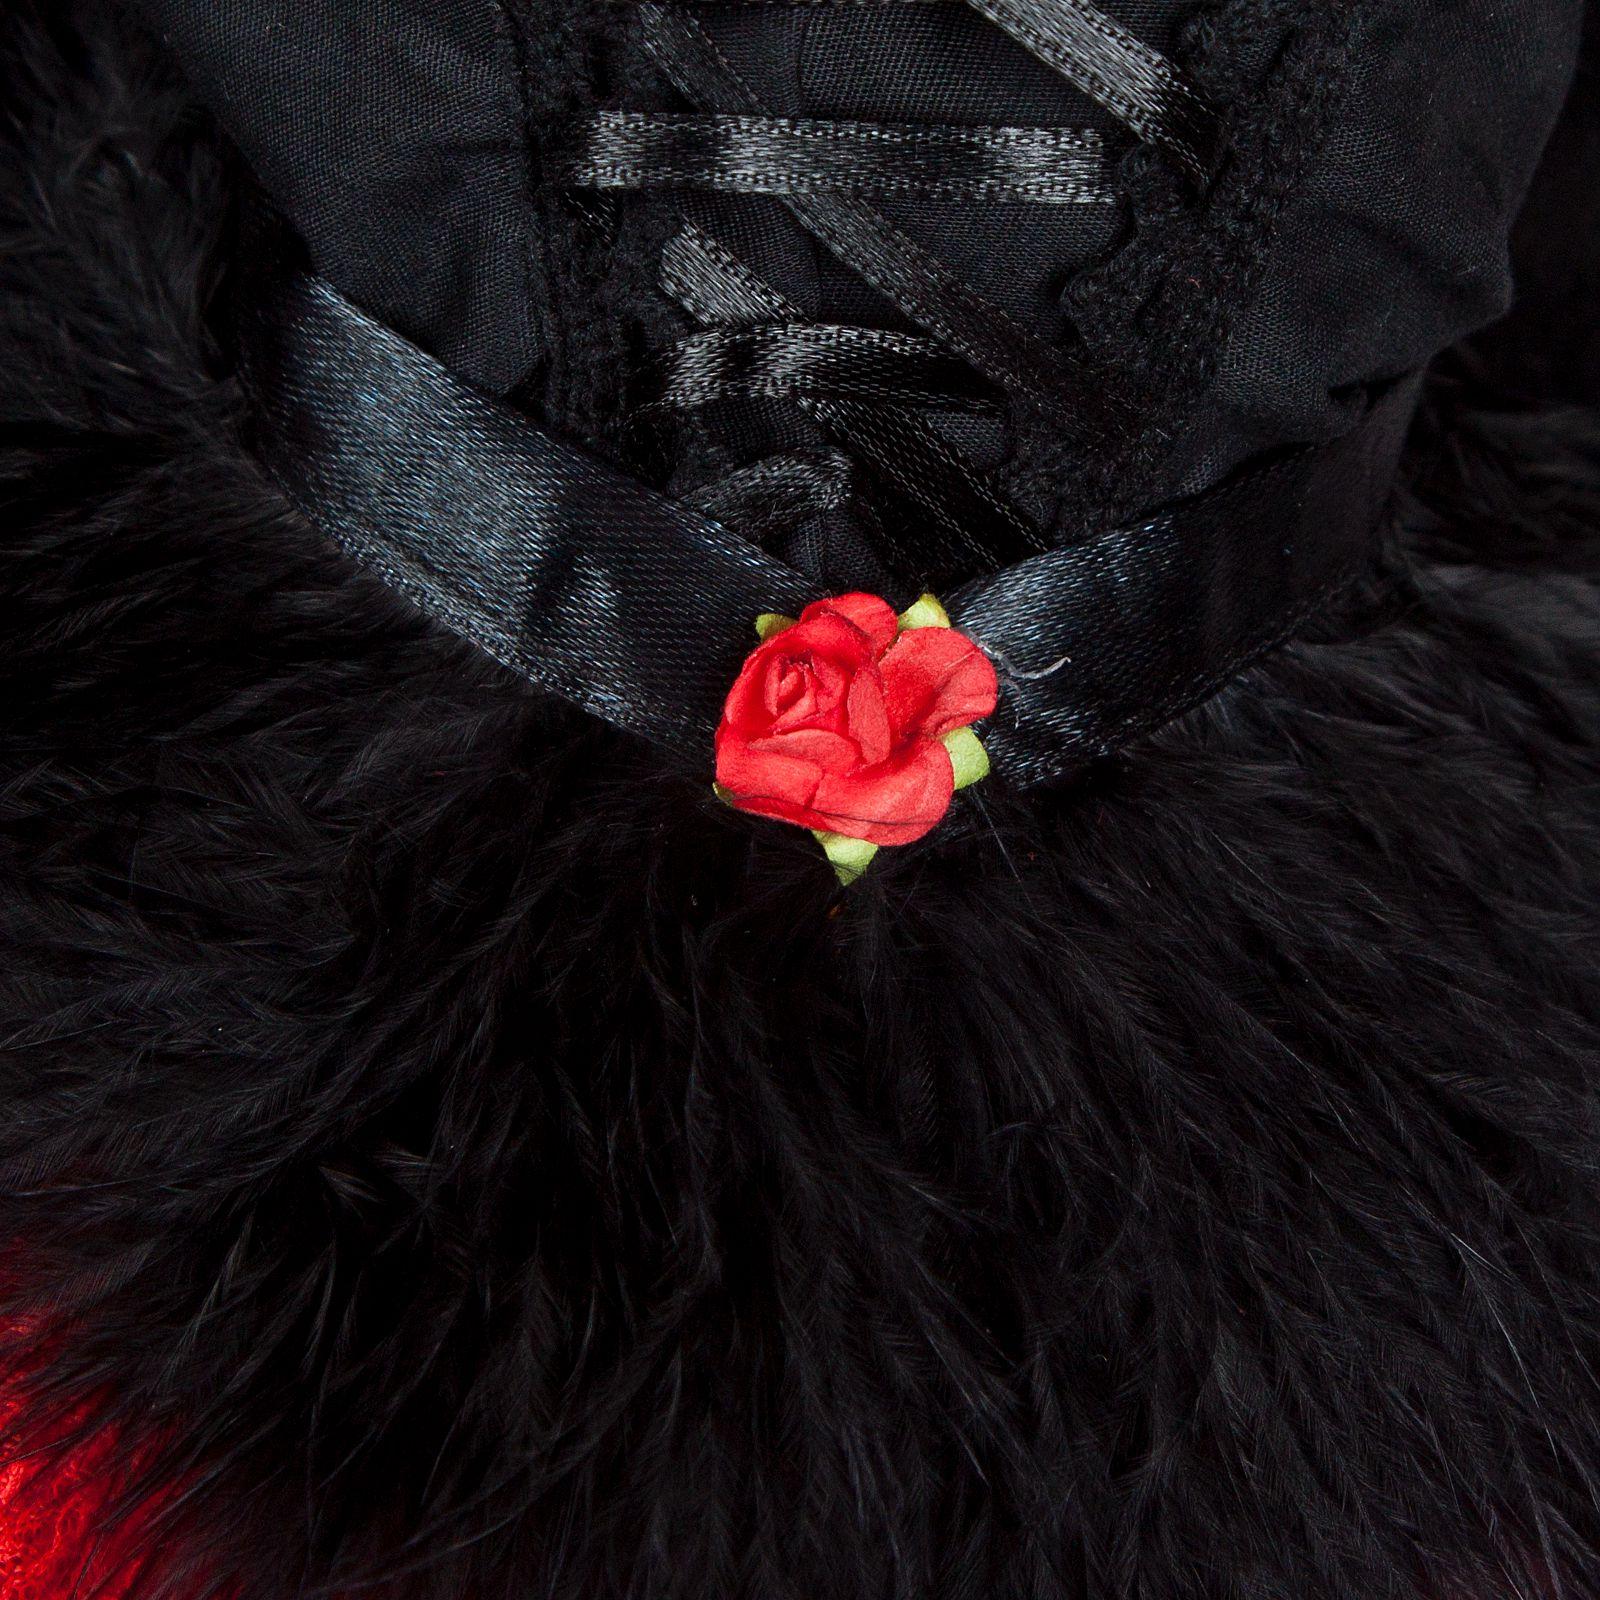 PF 705# Red And Black Dresses 1//4 Msd Dod Dz Aod Bjd Dollfie